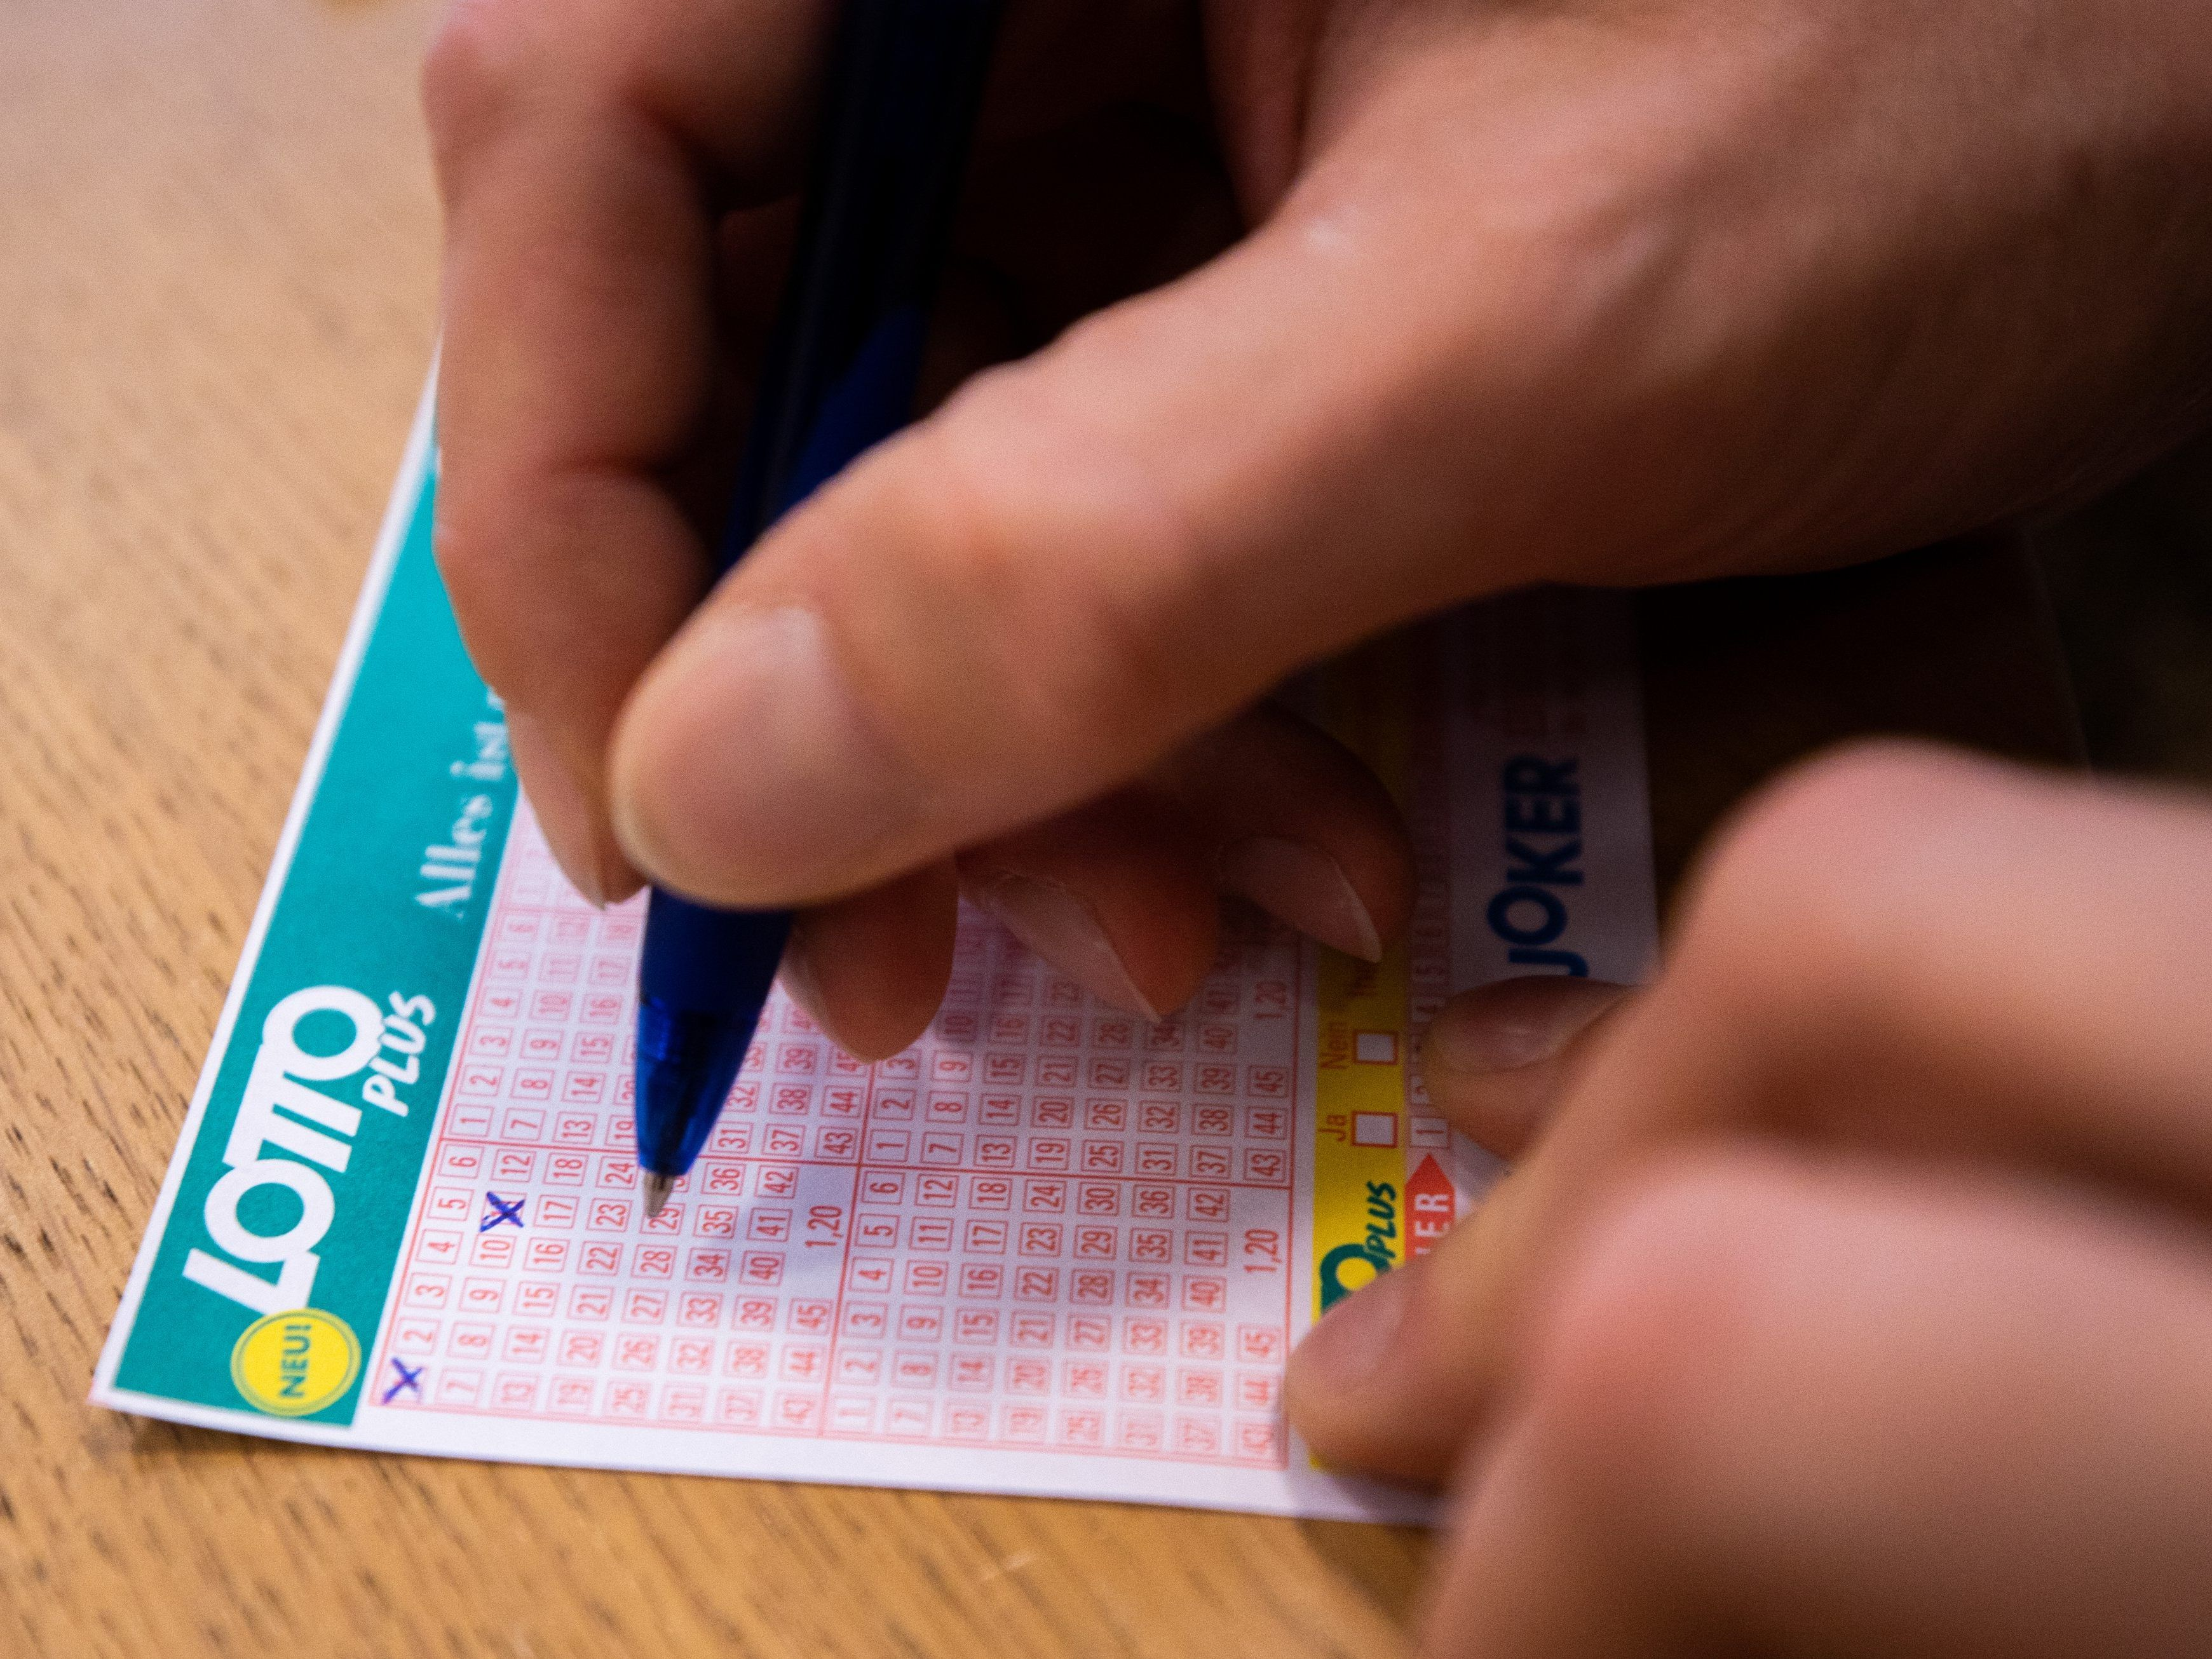 Lotto Doppeljackpot: Nun sind 2,3 Millionen zu holen